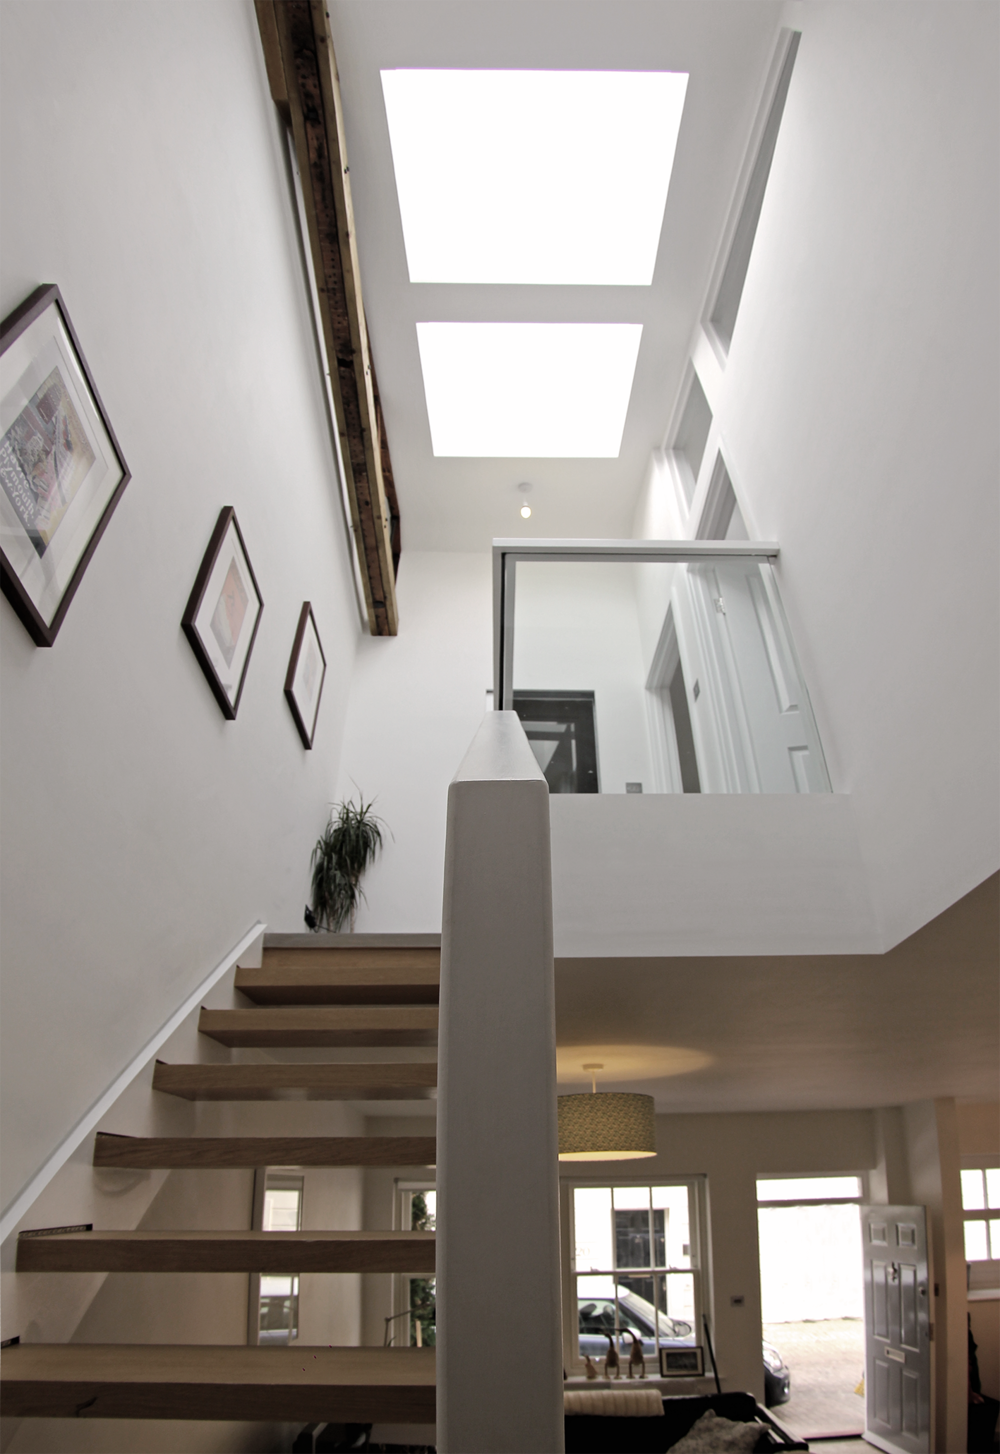 staircase copy copy - edit.png